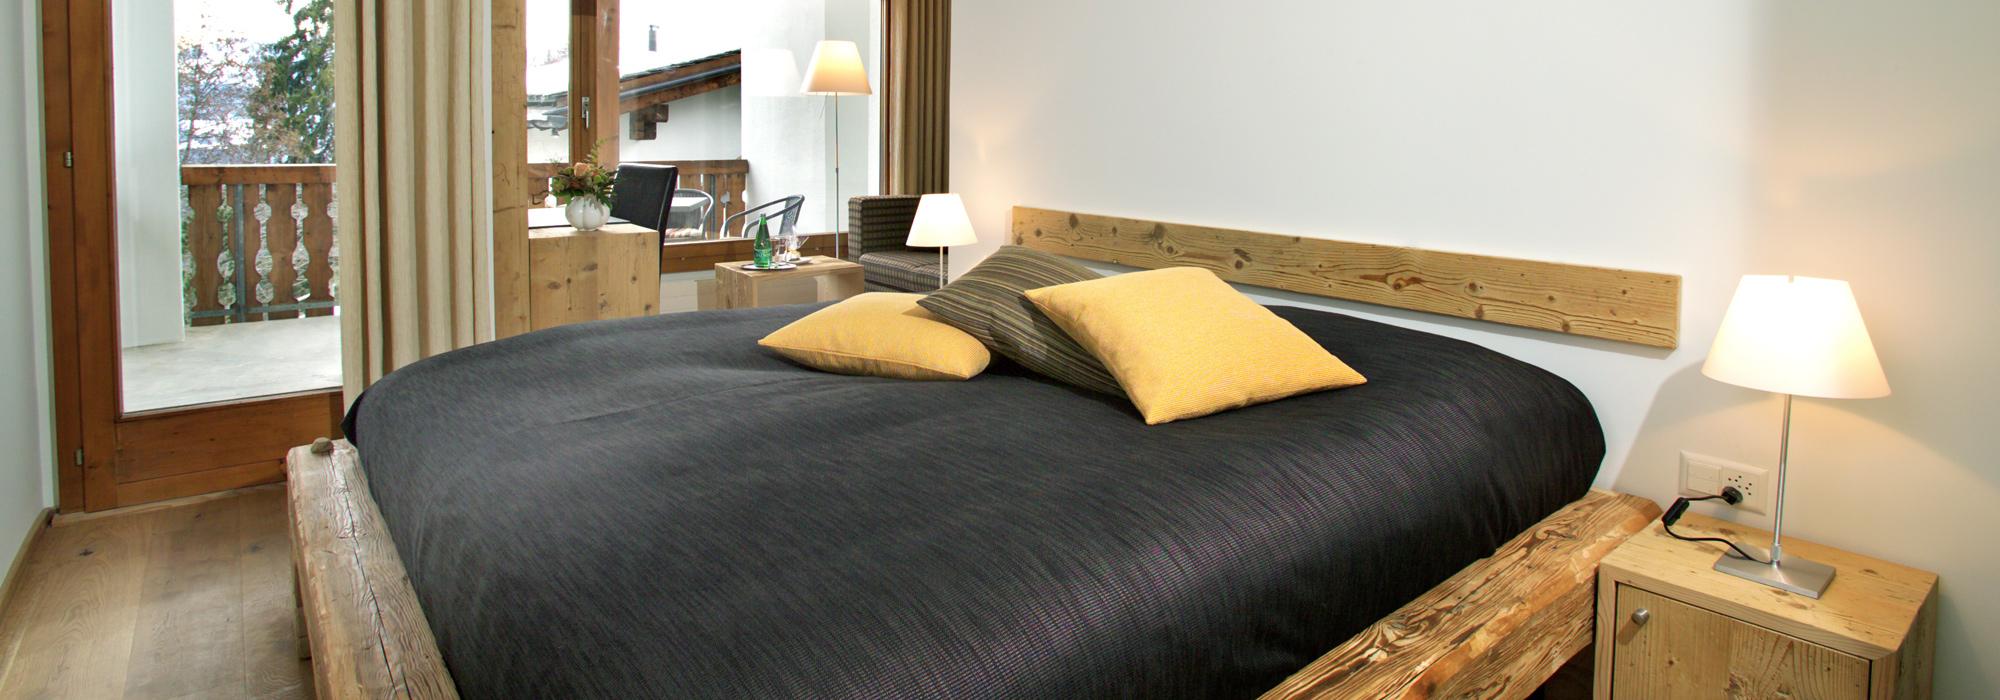 Room hotel Fidazerhof